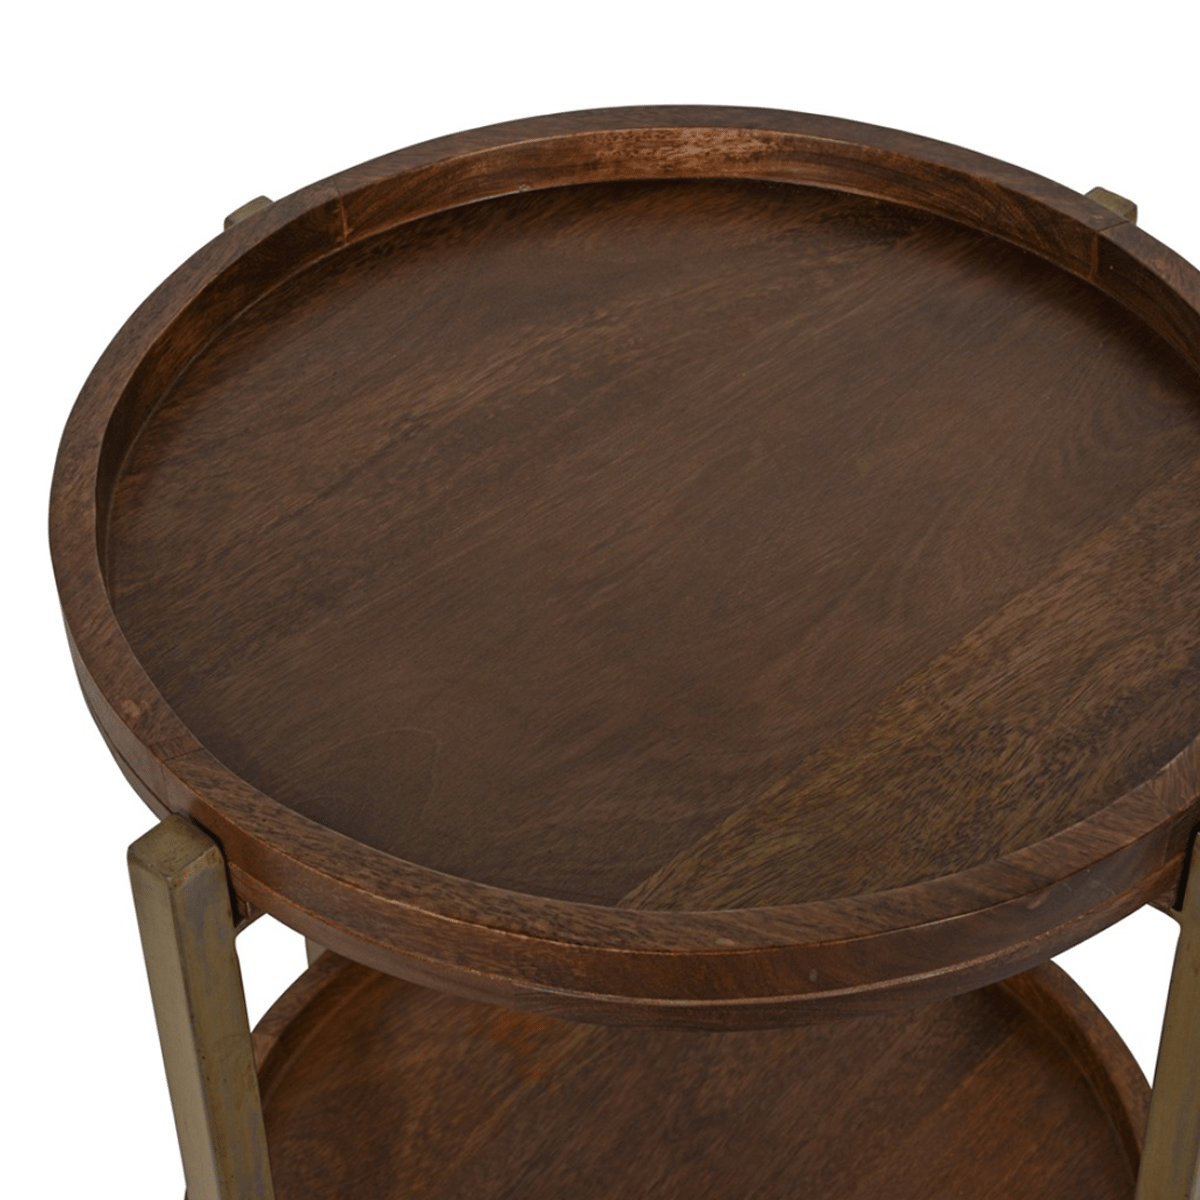 baxter-side-table-3-shopceladon